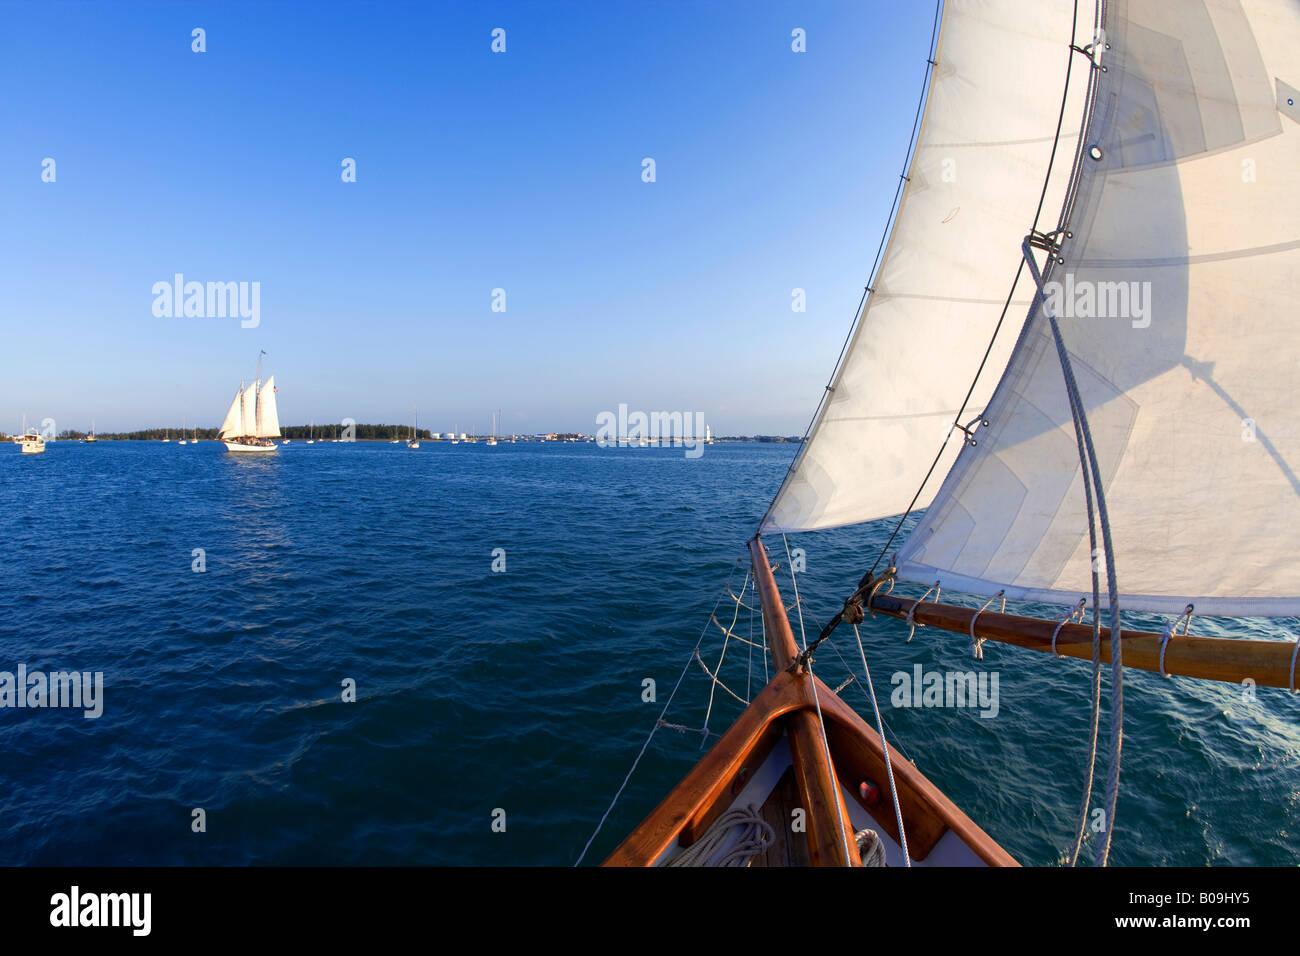 Sailing in Key West, Florida, USA - Stock Image